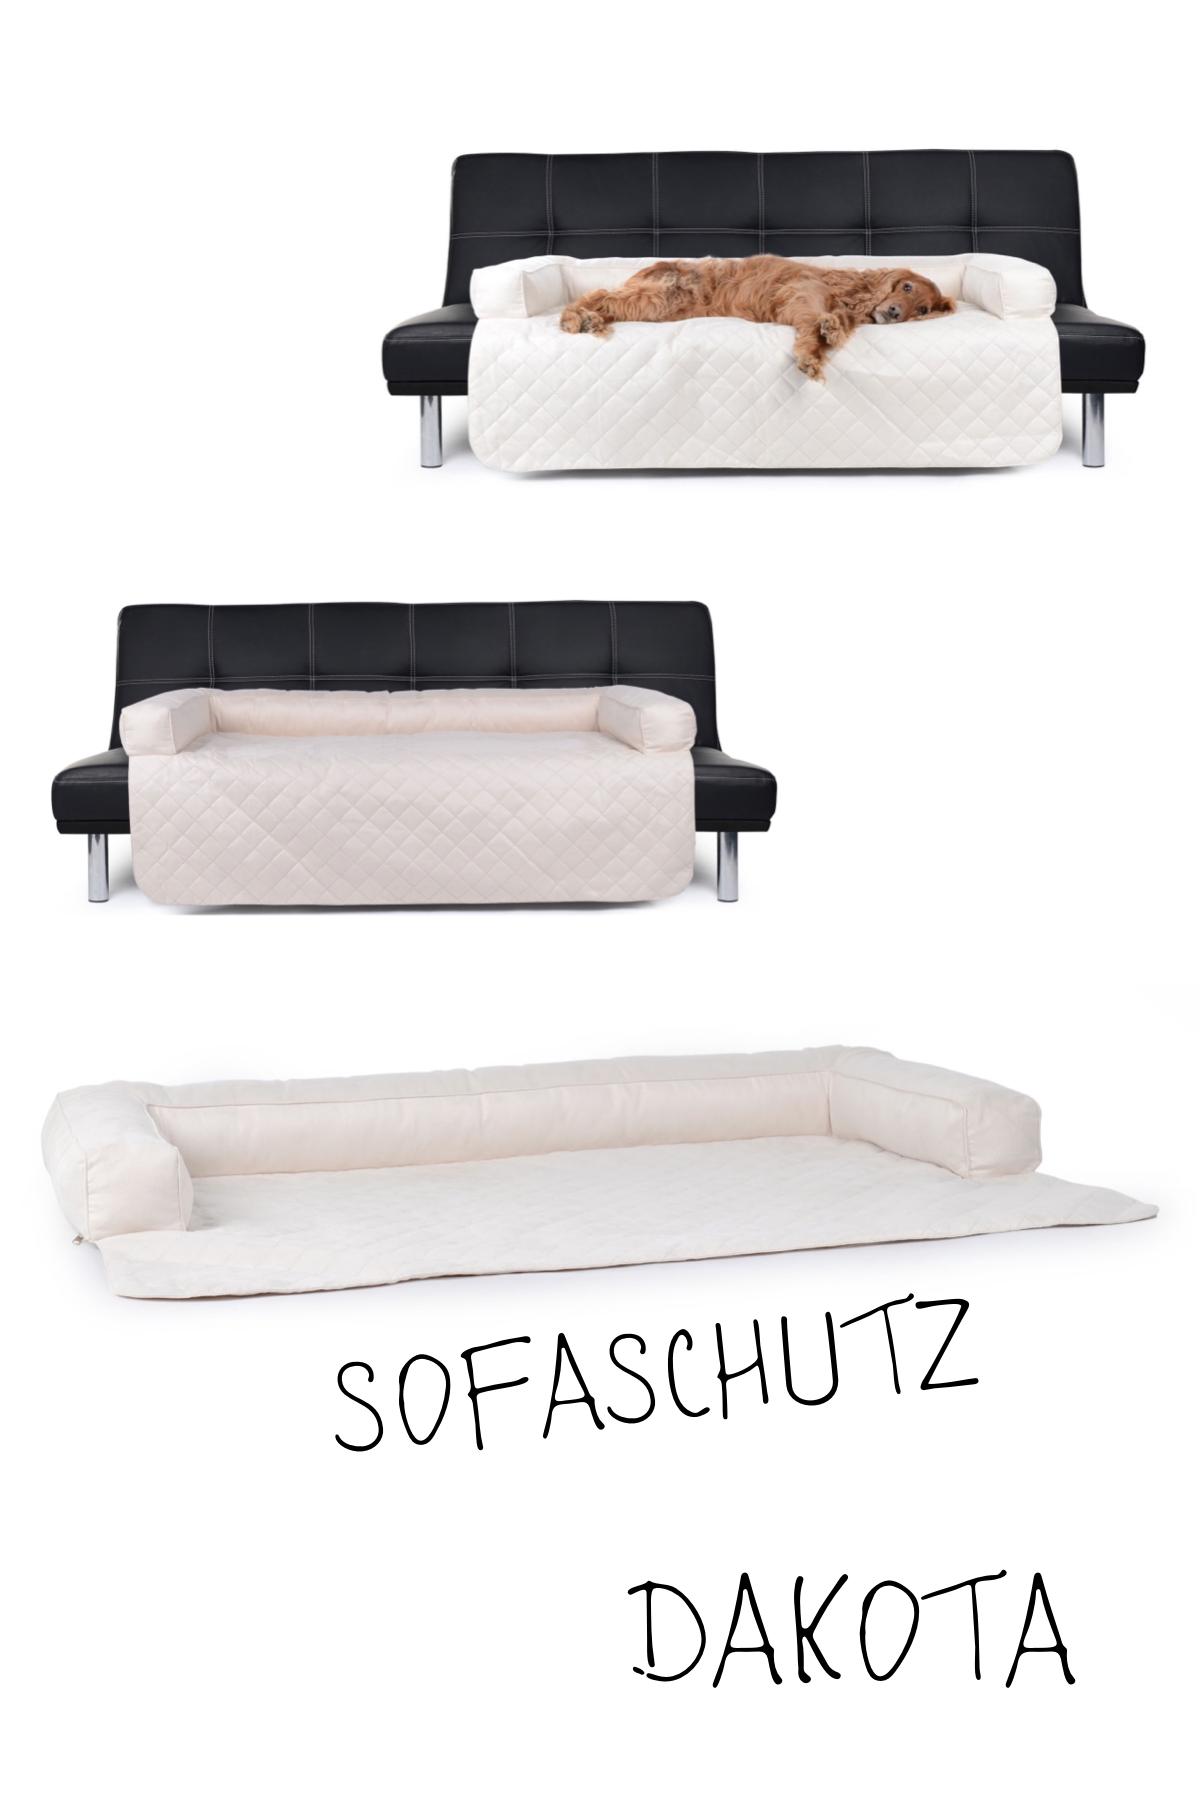 Hunde Sofaschutz Decke Dakota Wildlederimitat 145x100 Cm Creme Sofaschutz Hundedecke Und Hunde